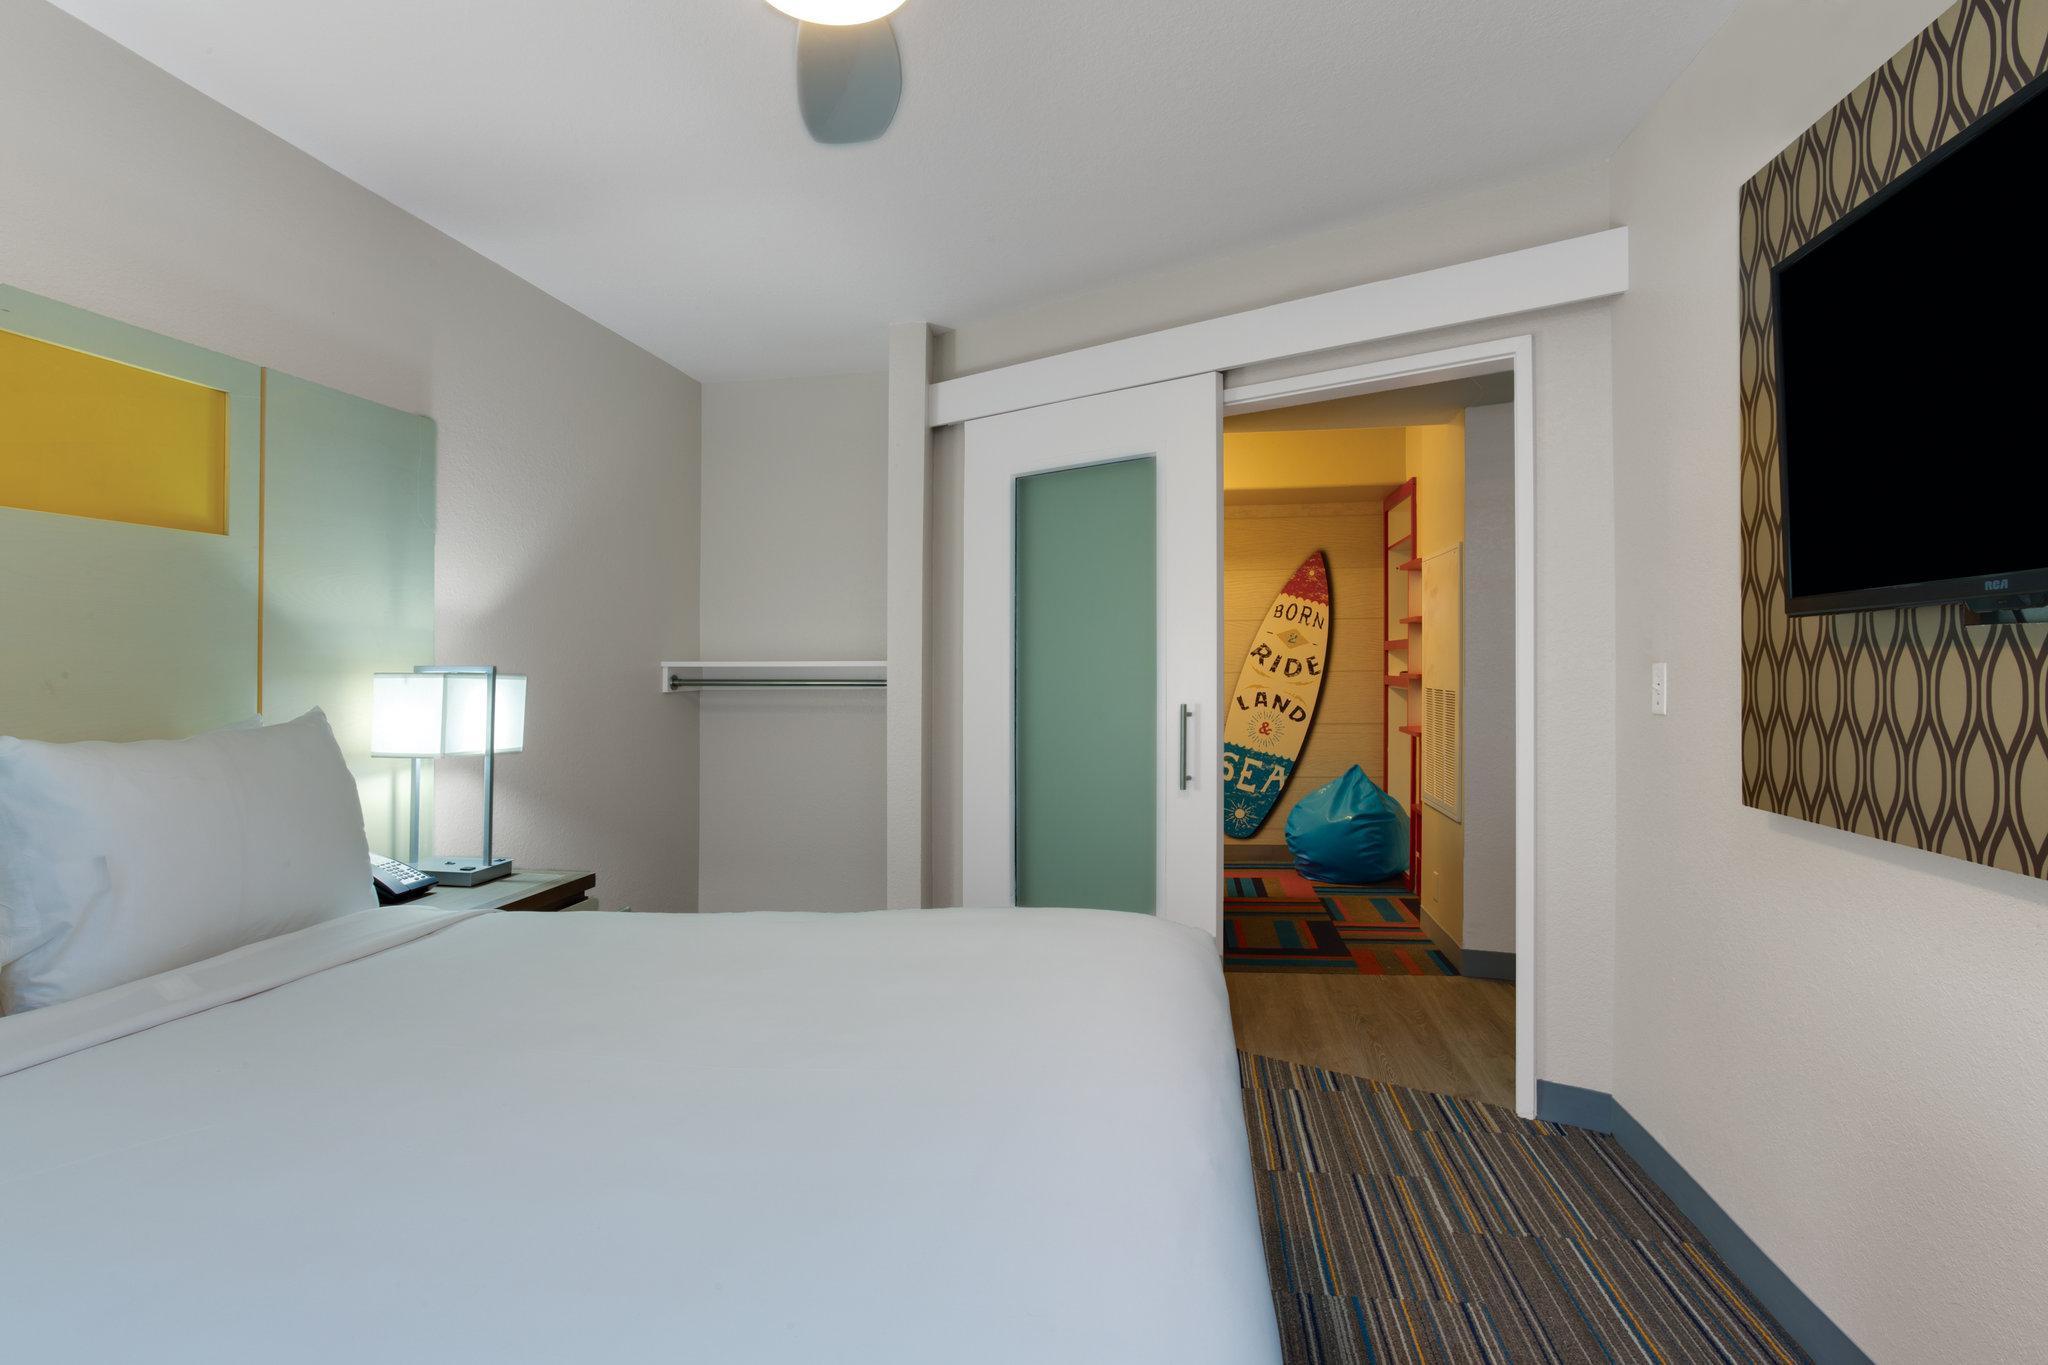 Holiday Inn Resort Orlando Suites Waterpark Hotel Orlando Fl Deals Photos Reviews,Black And White Wallpaper Bathroom